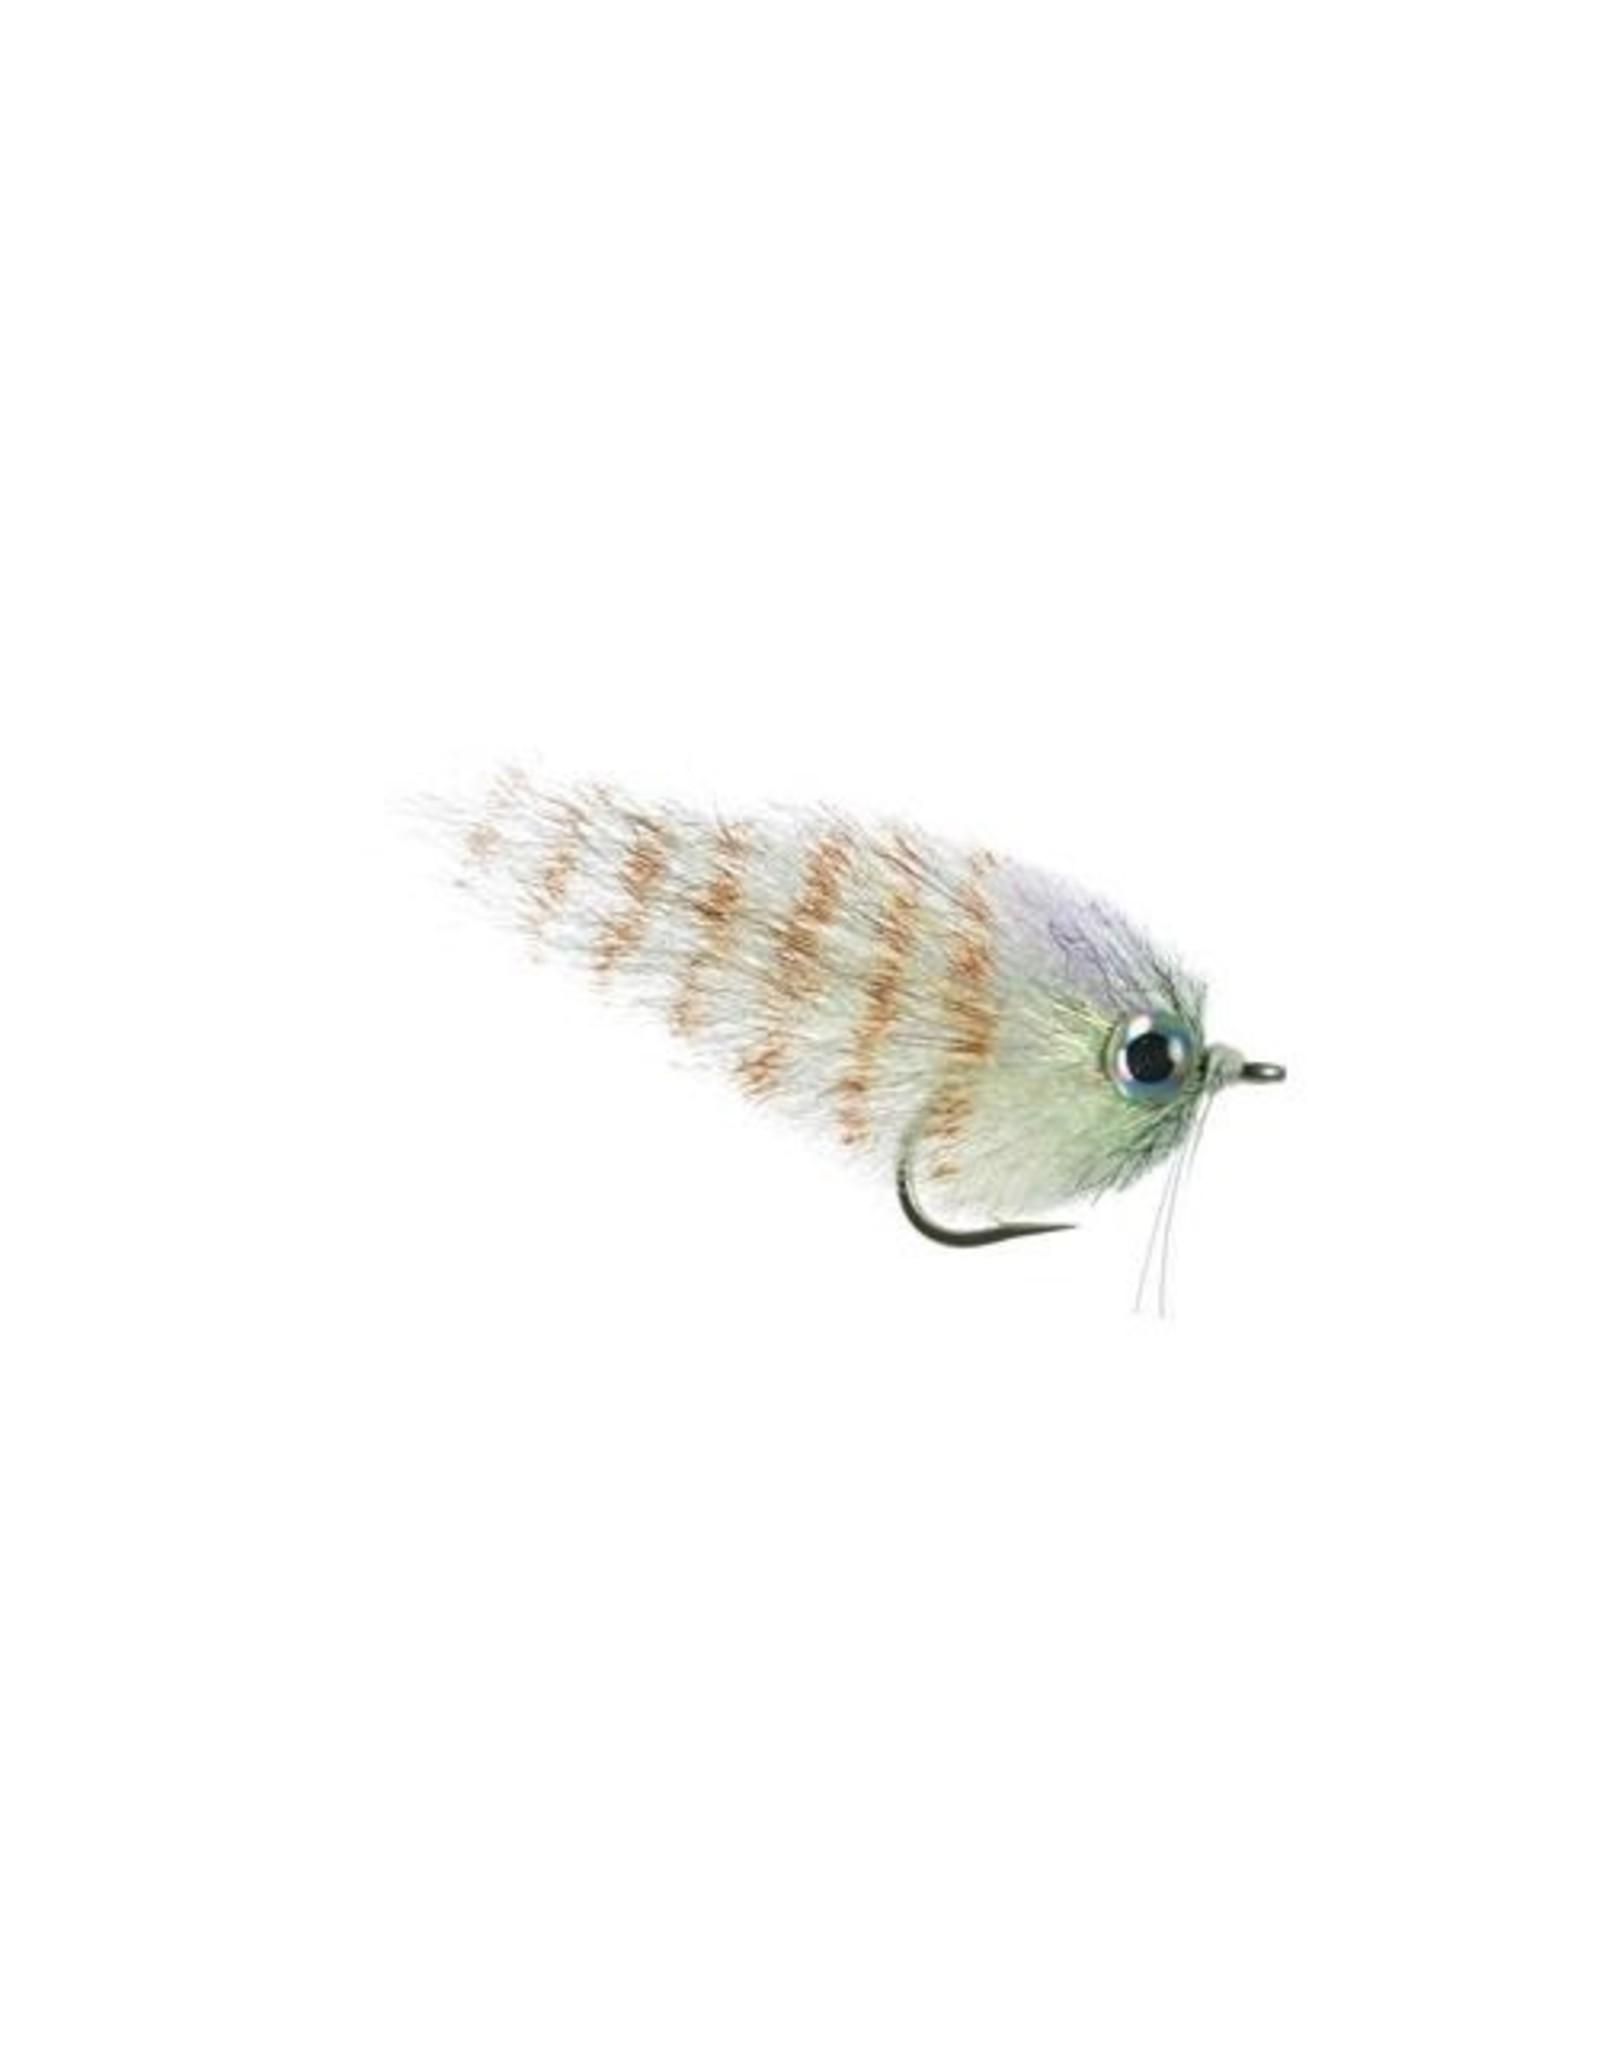 Umpua Umpqua Baitfish Glades 02